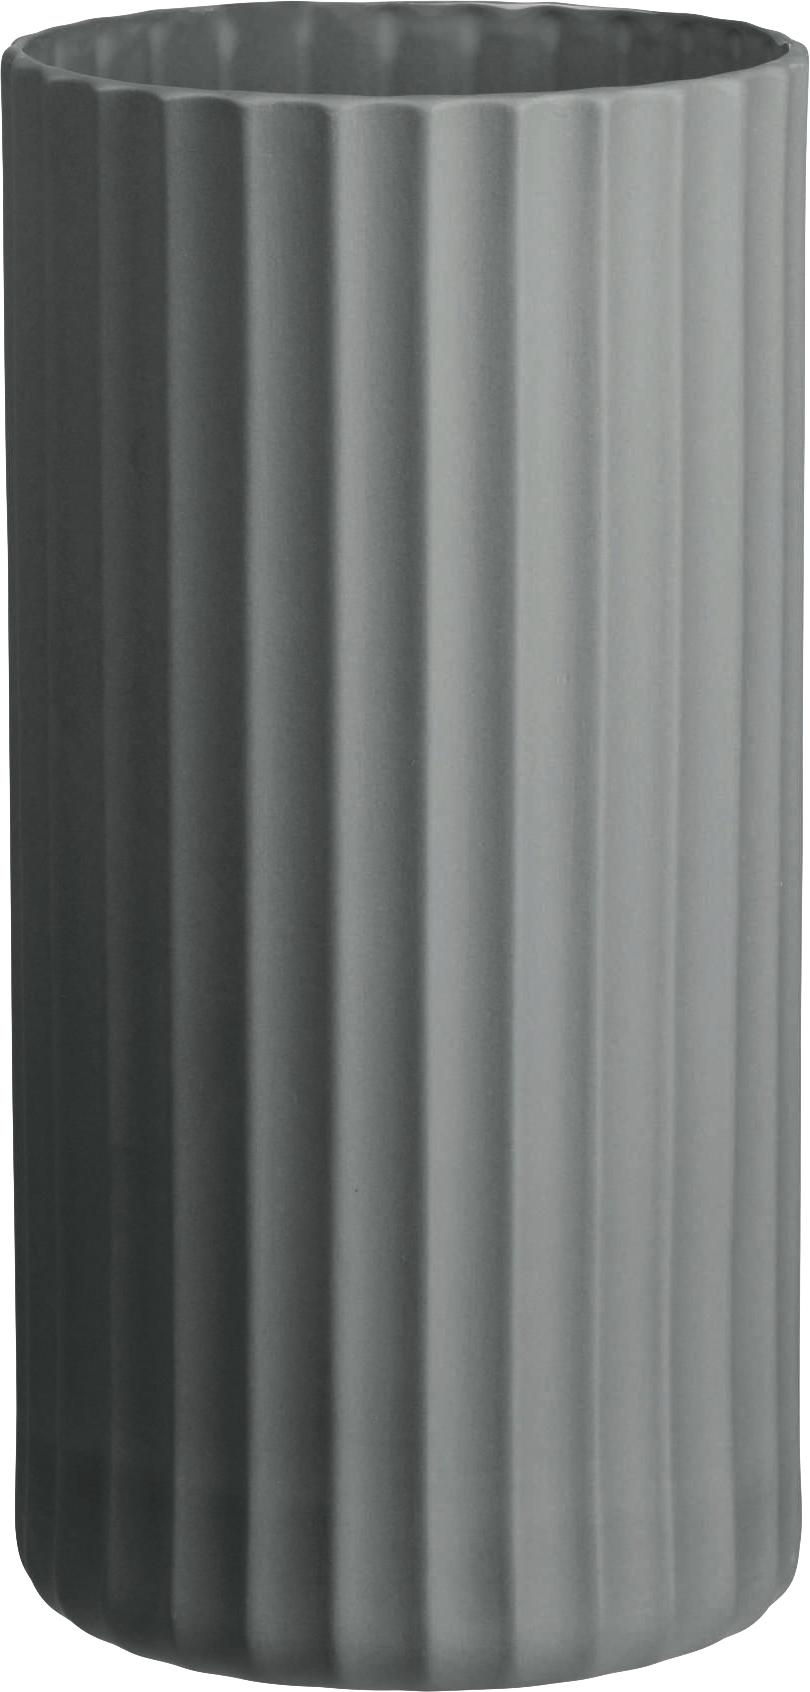 Handgefertigte Vase Yoko aus Porzellan, Porzellan, Grau, Ø 12 x H 24 cm